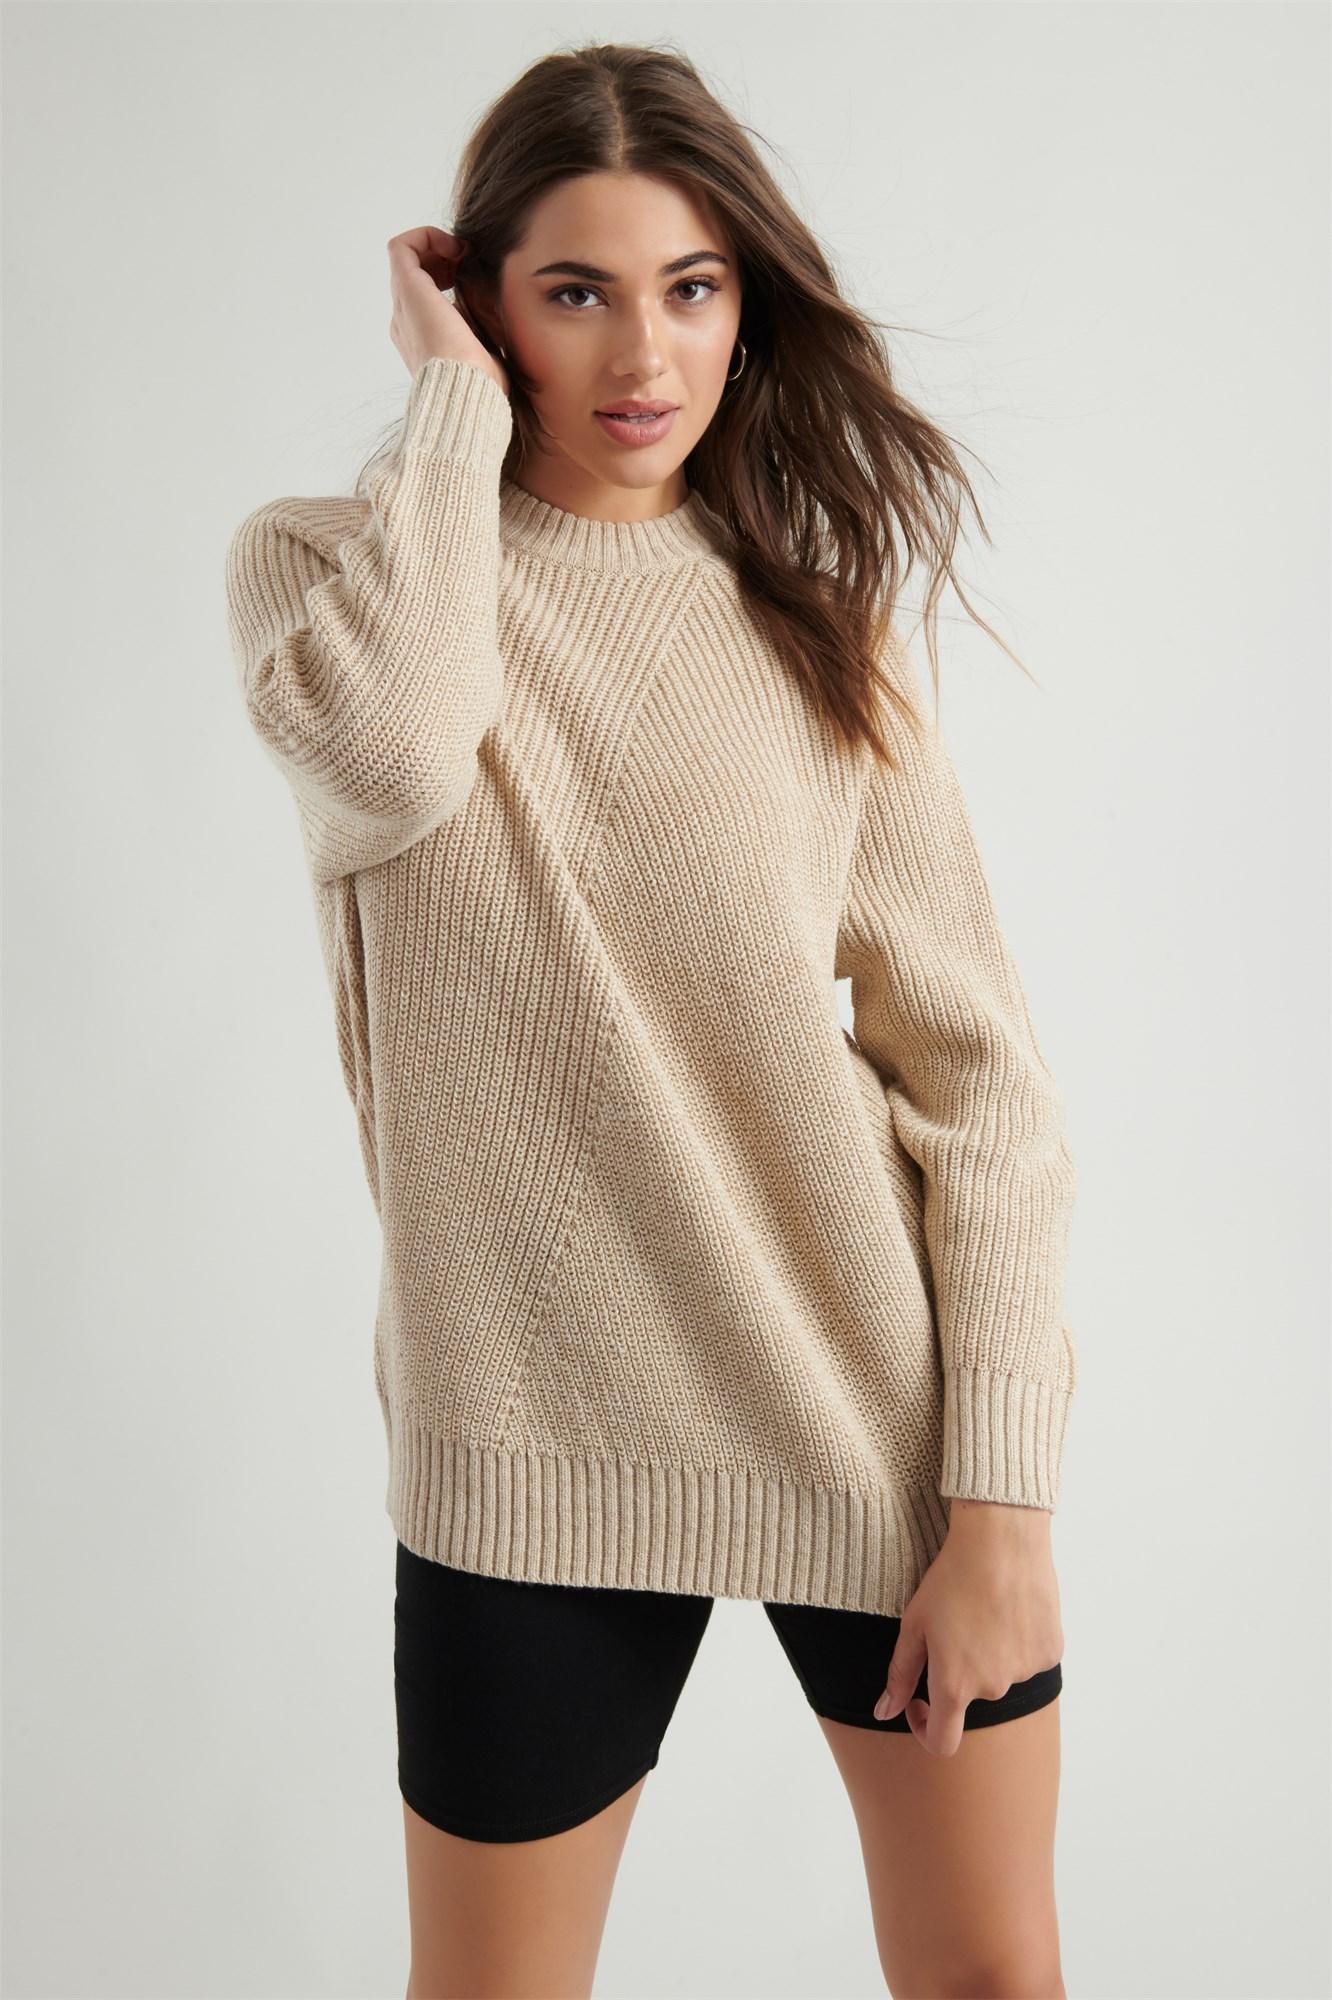 Image 2 of Crew Neck Tunic Sweater